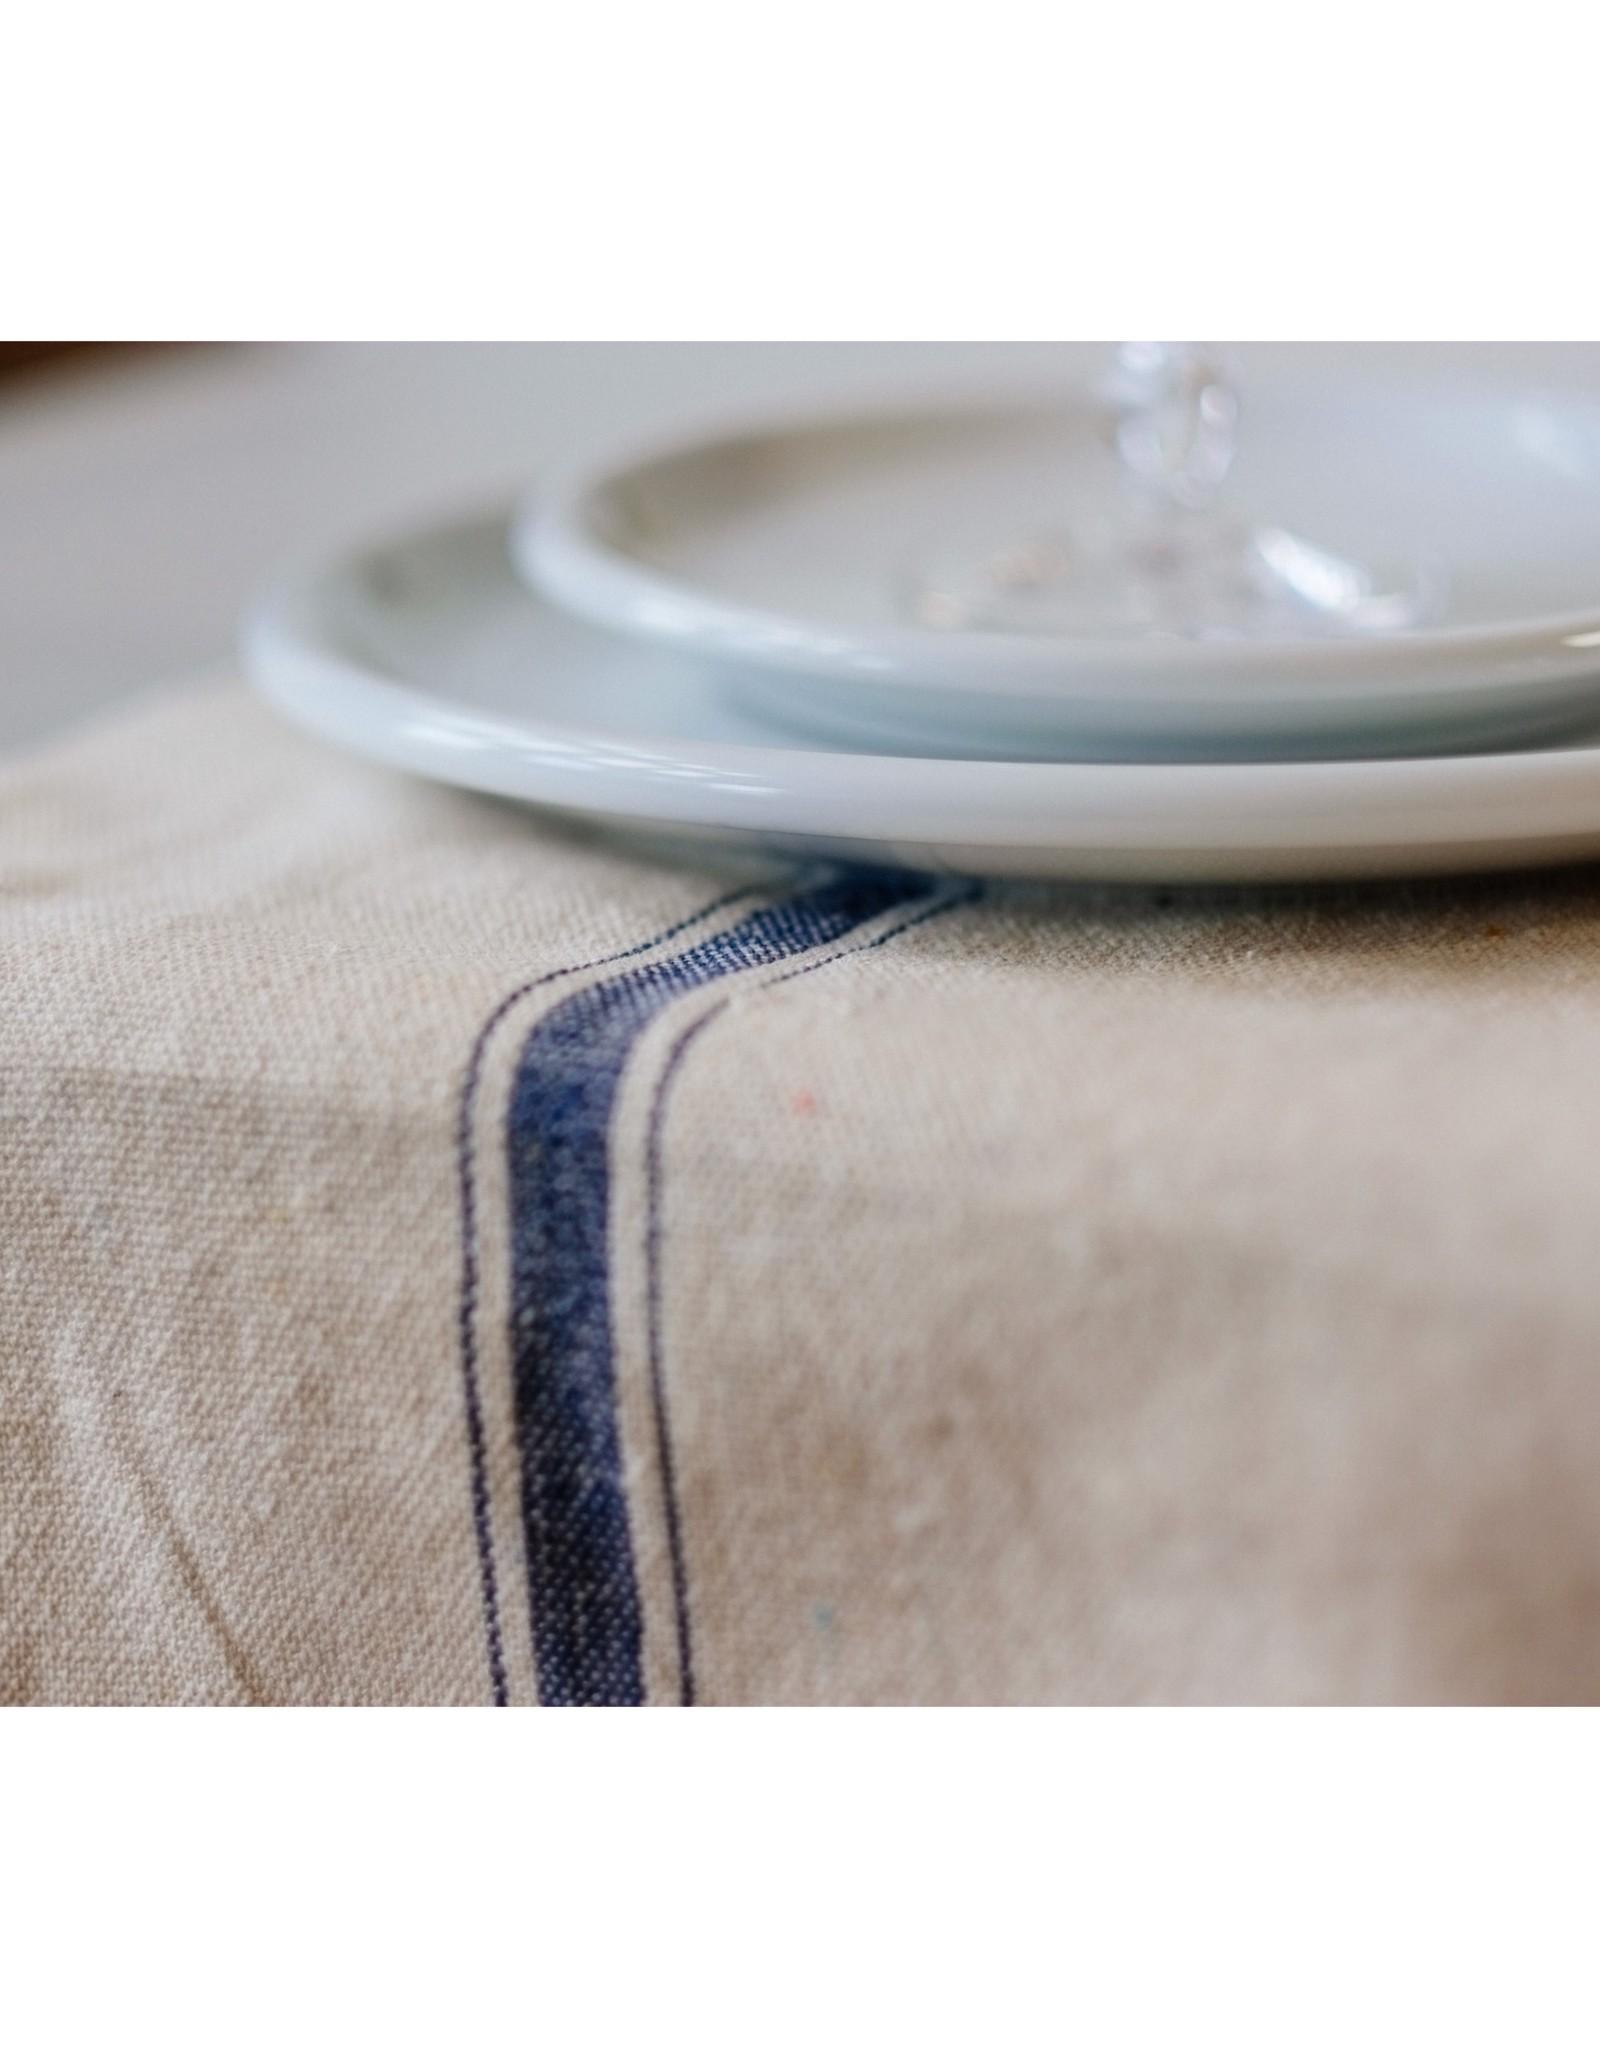 Old Lake George Table Runner - Blue Three Stripe